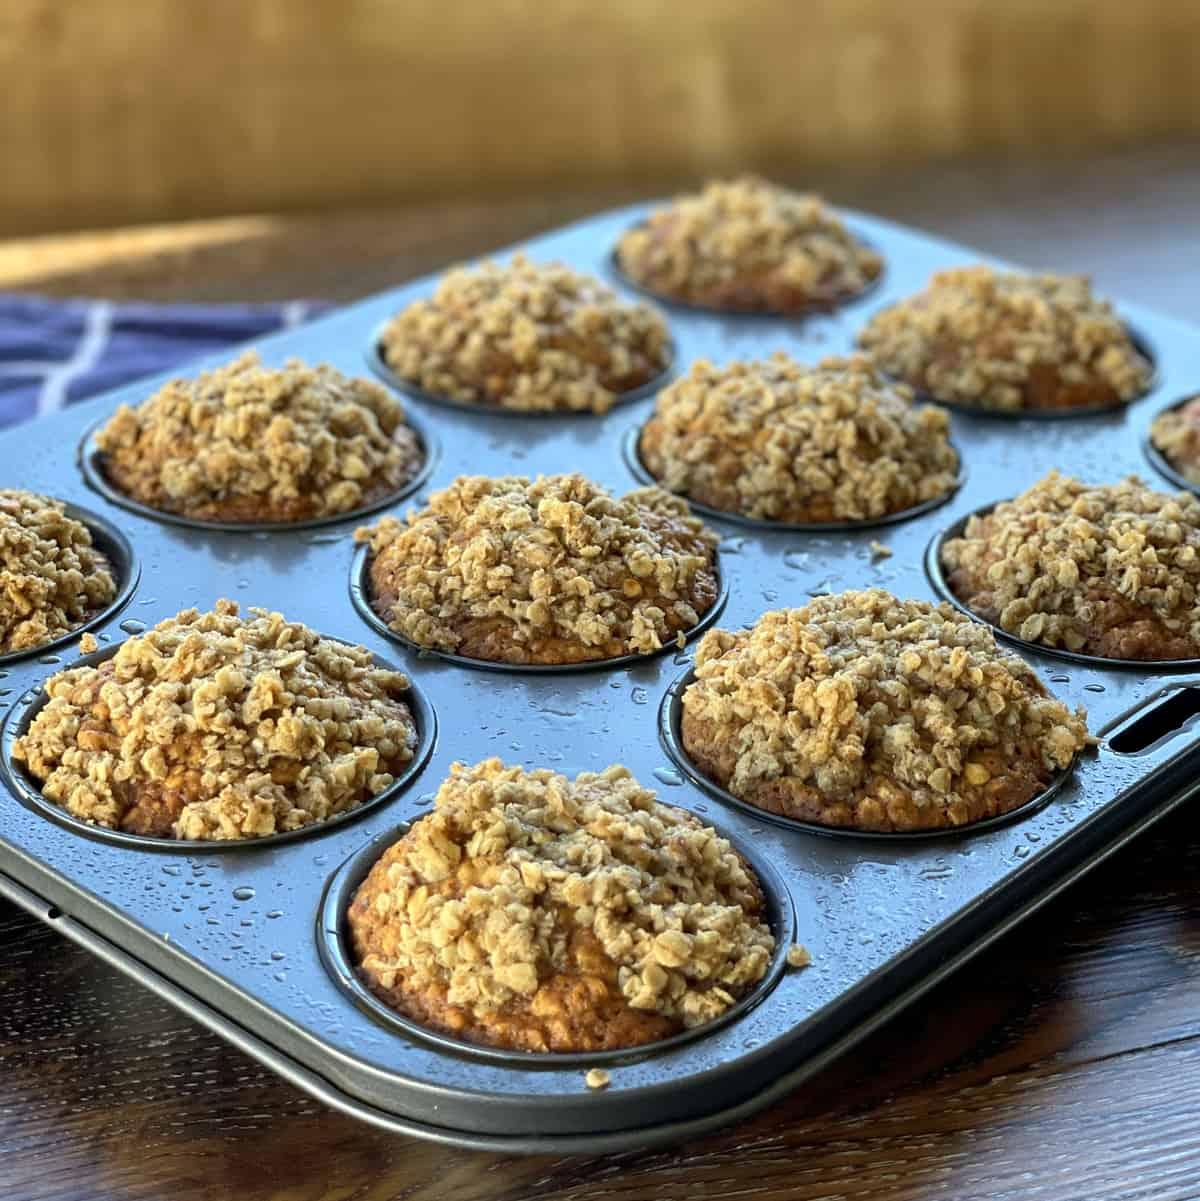 Freshly baked warm banana oat muffins